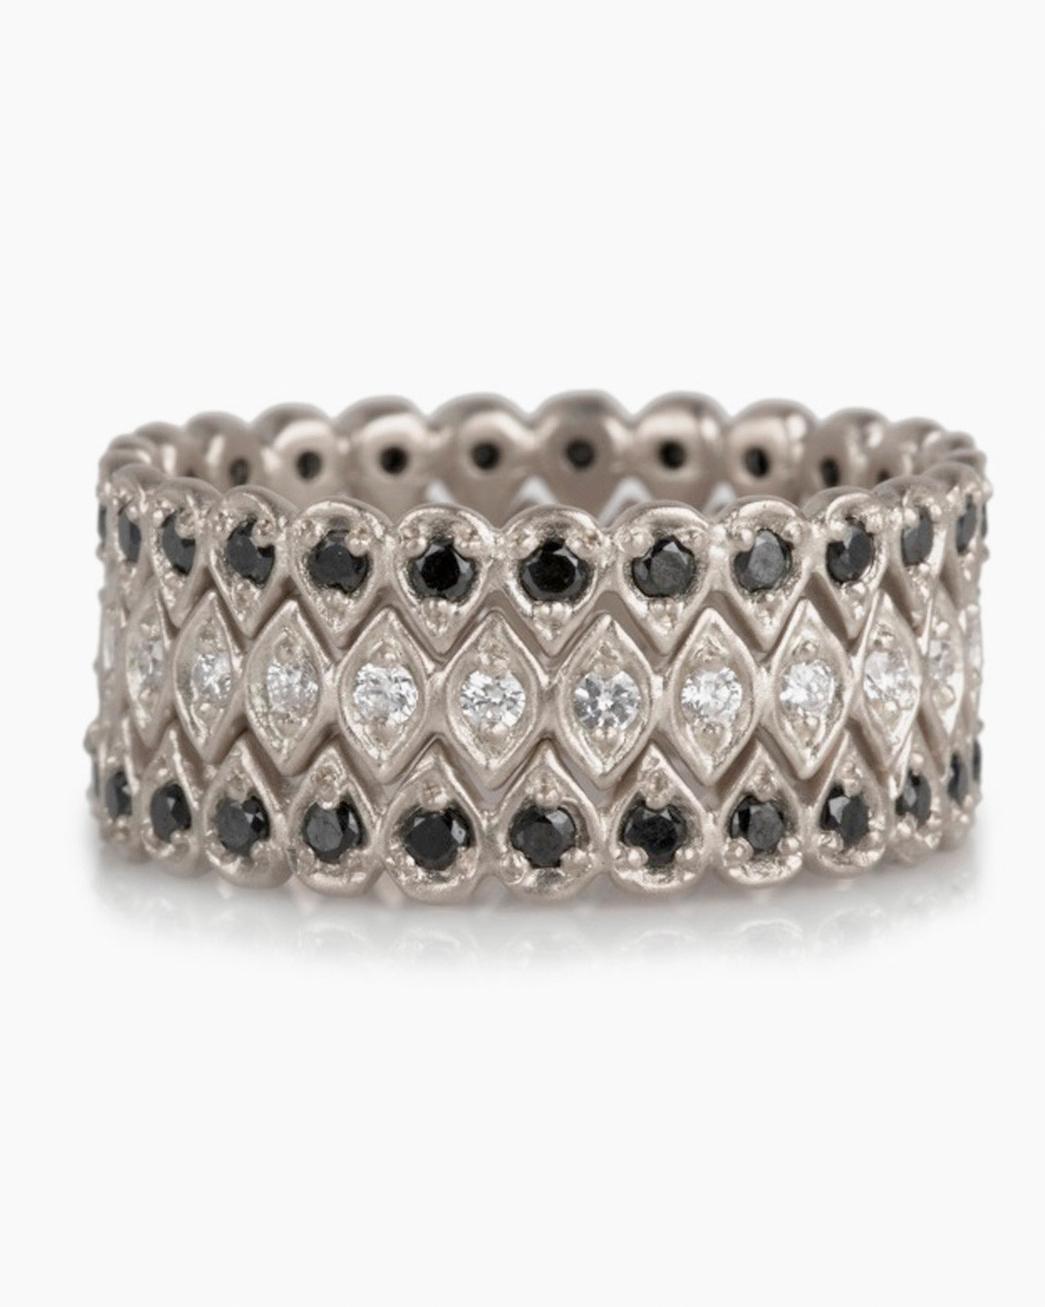 black-diamond-engagement-rings-jamie-wolf-2-0814.jpg